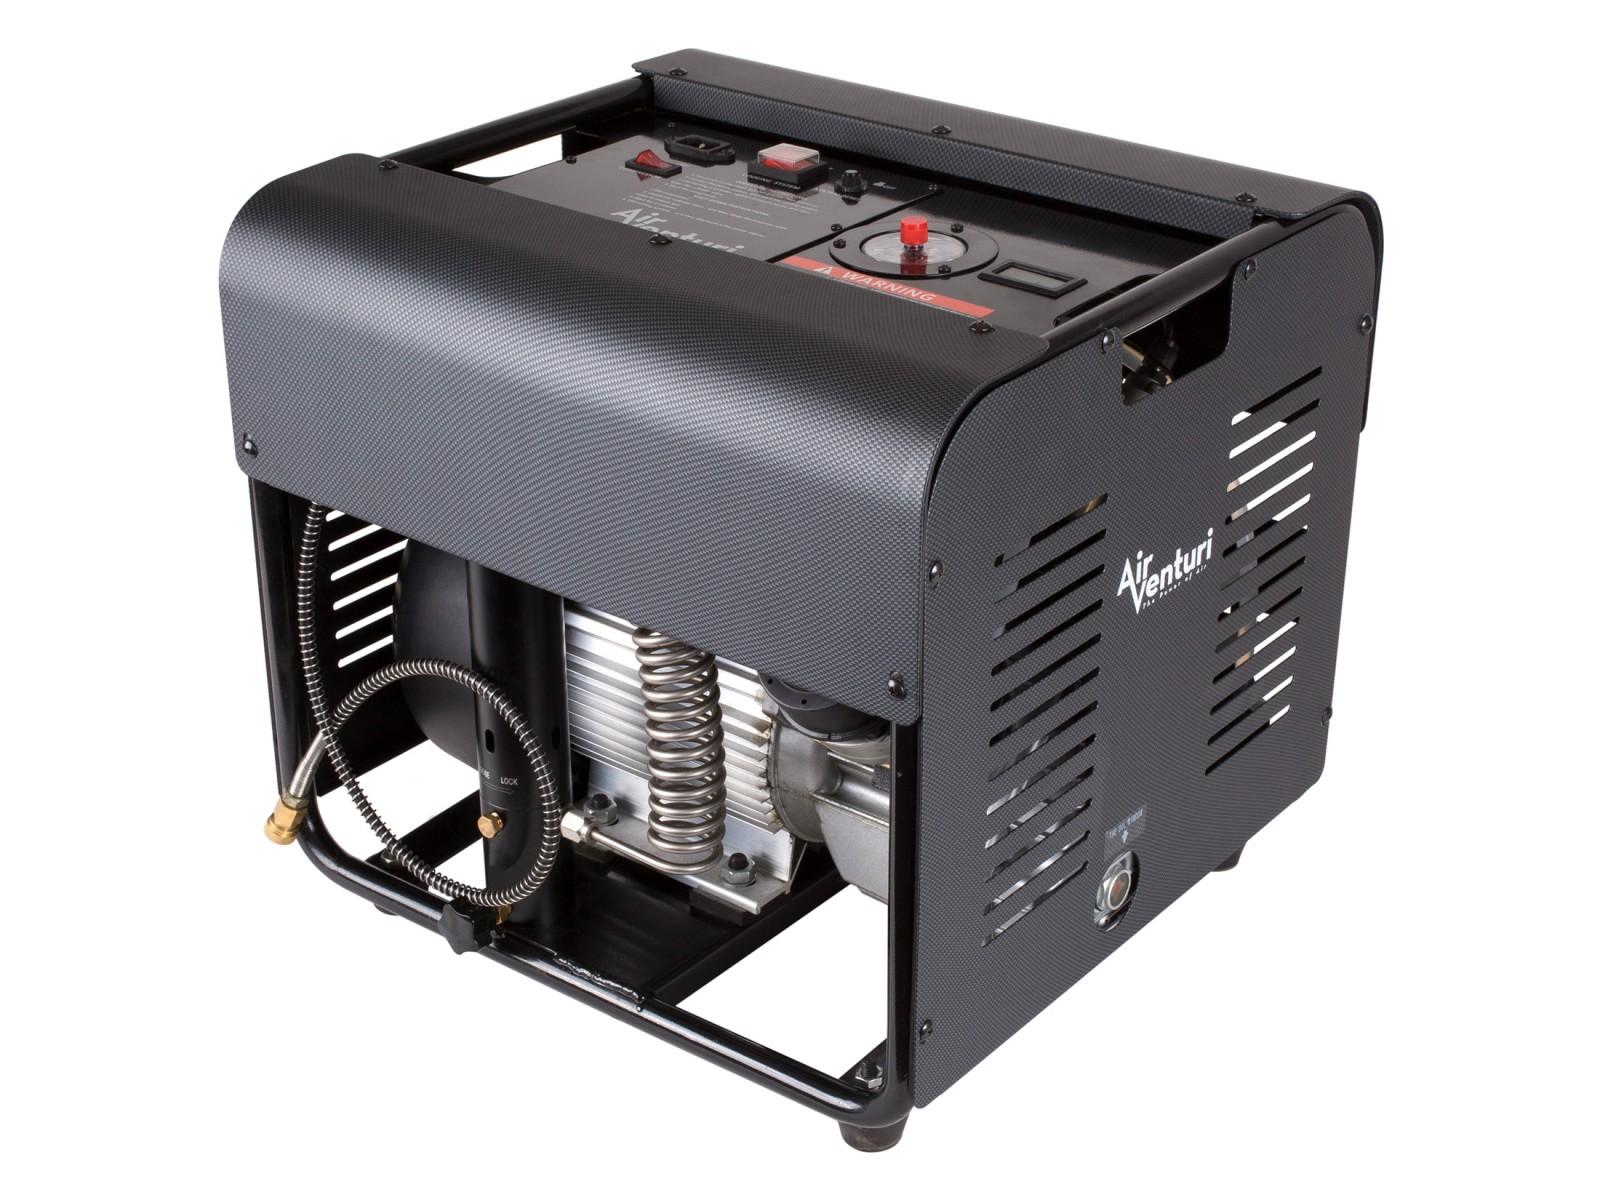 Air Venturi Air Compressor, Electric, 4500 PSI/310 Bar 220V Version